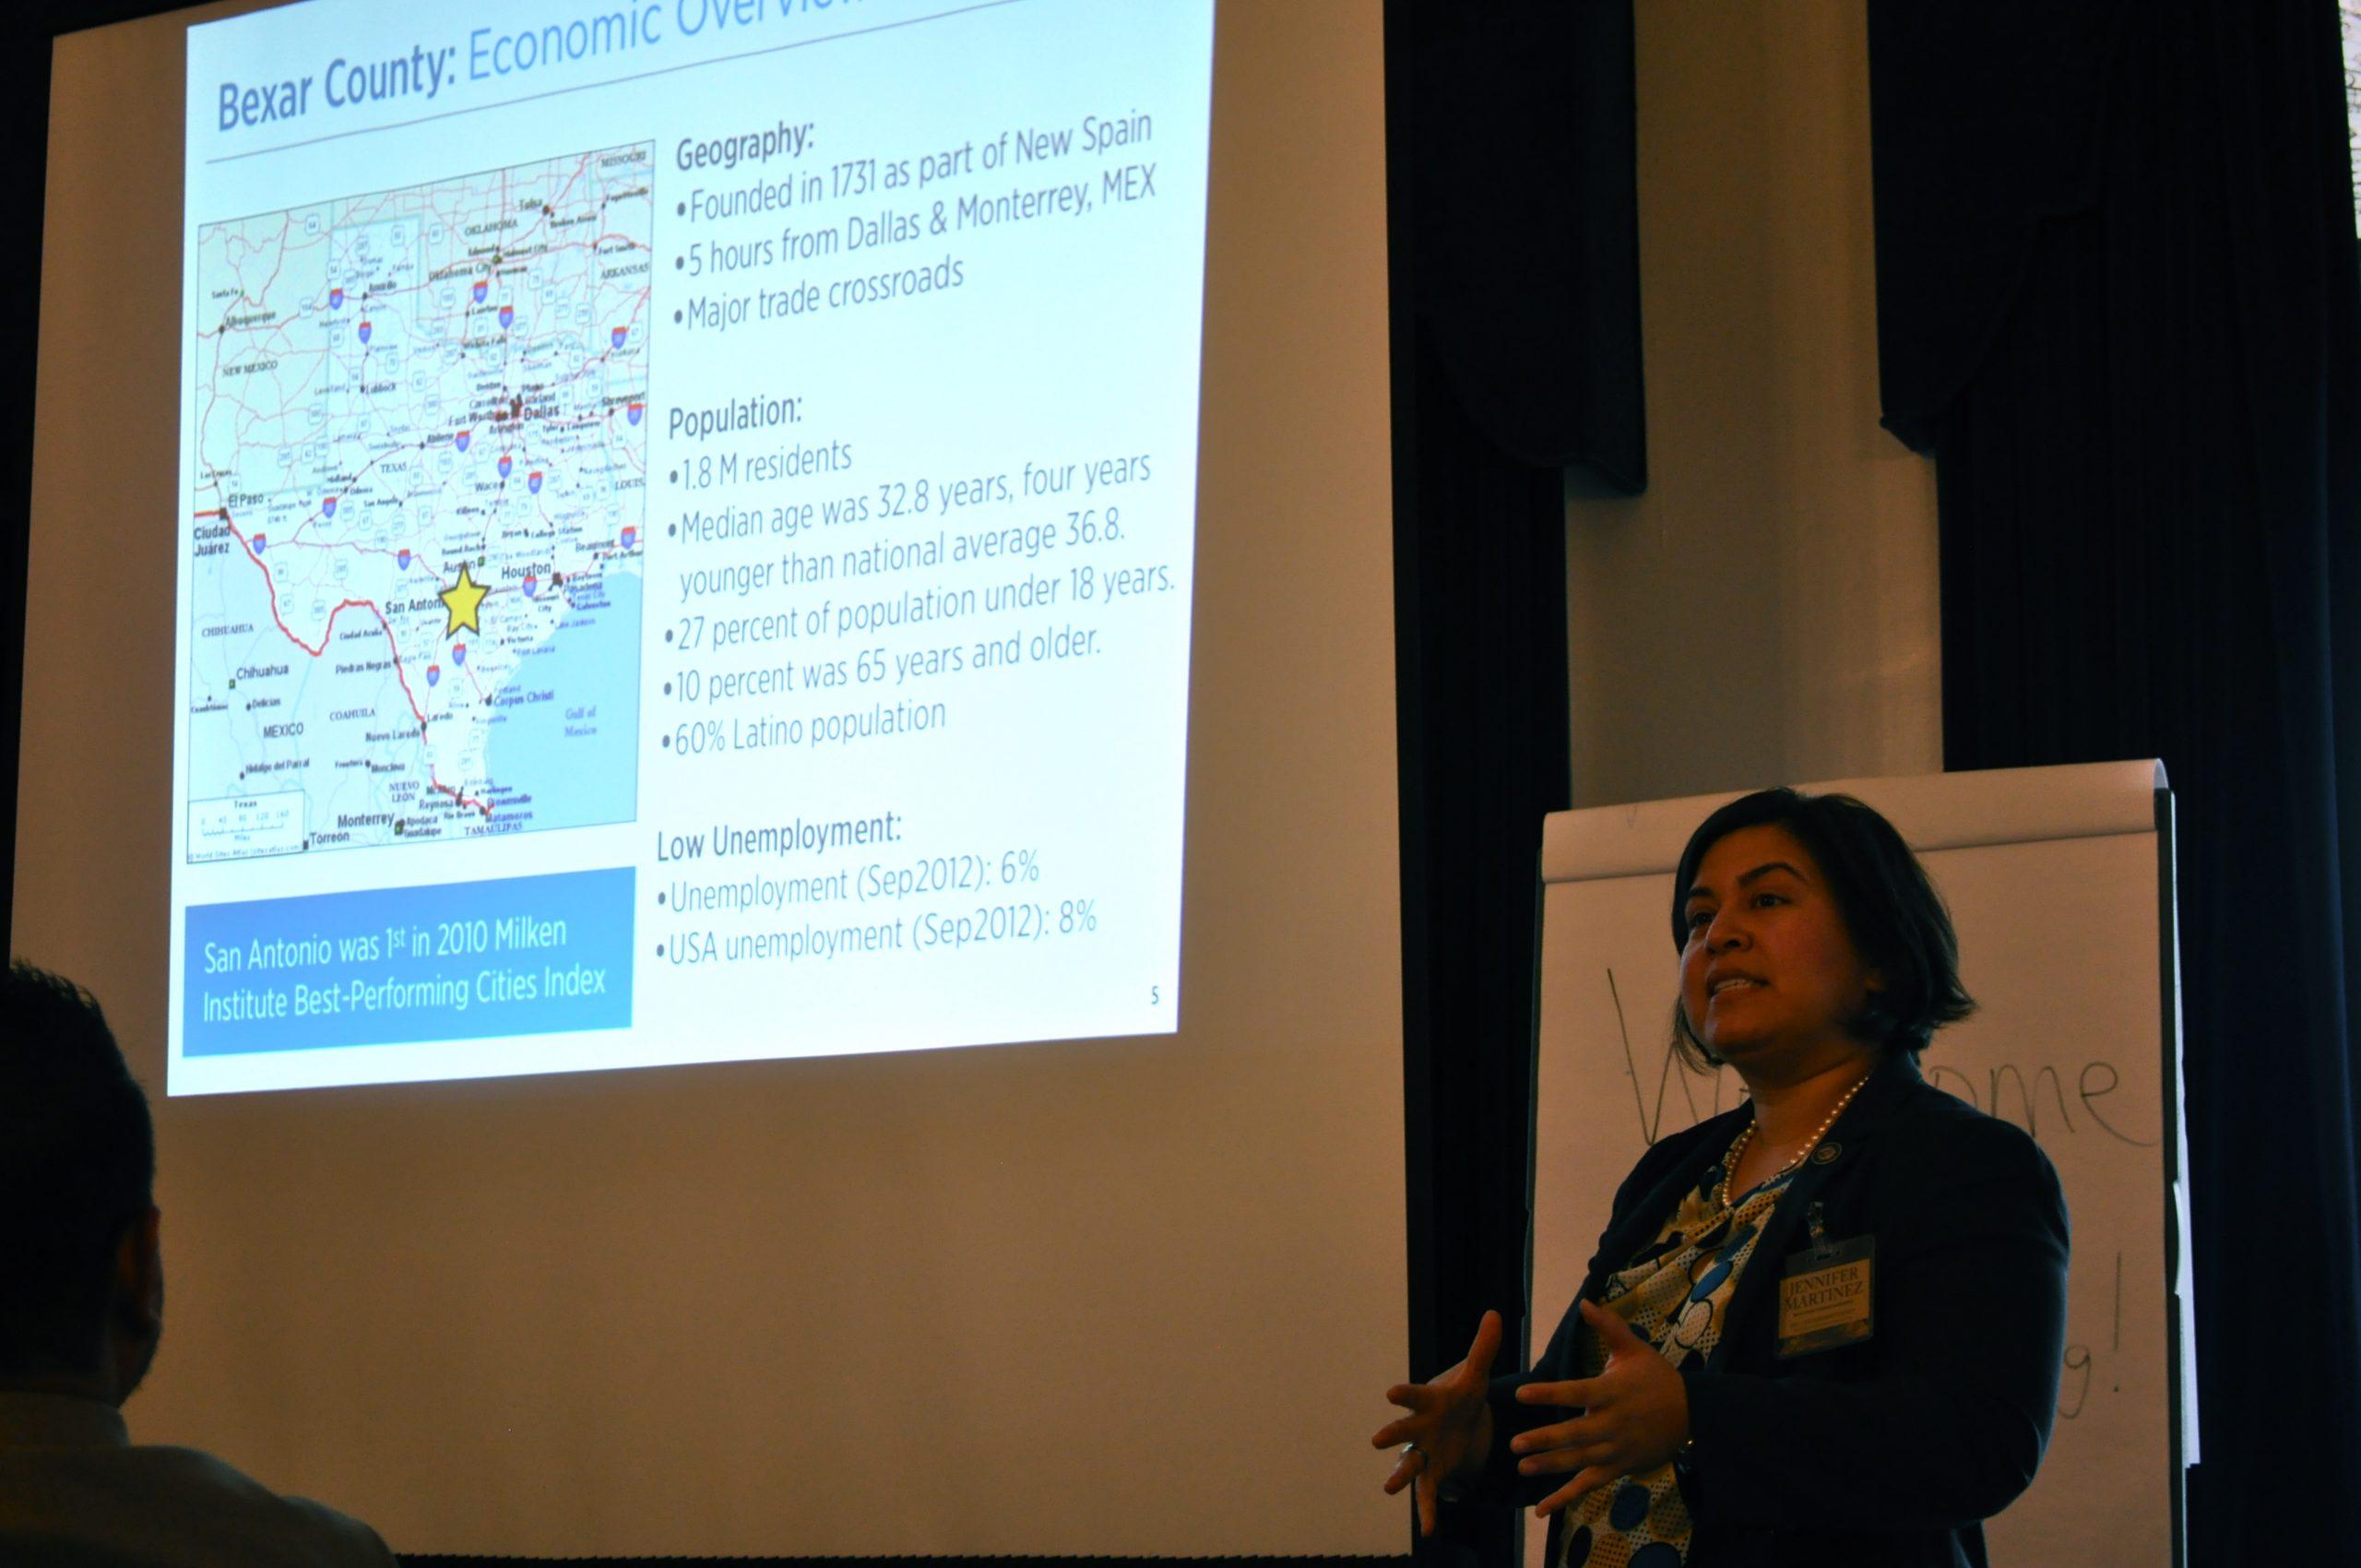 Jen Martinez, of the Bexar County Economic Development office,